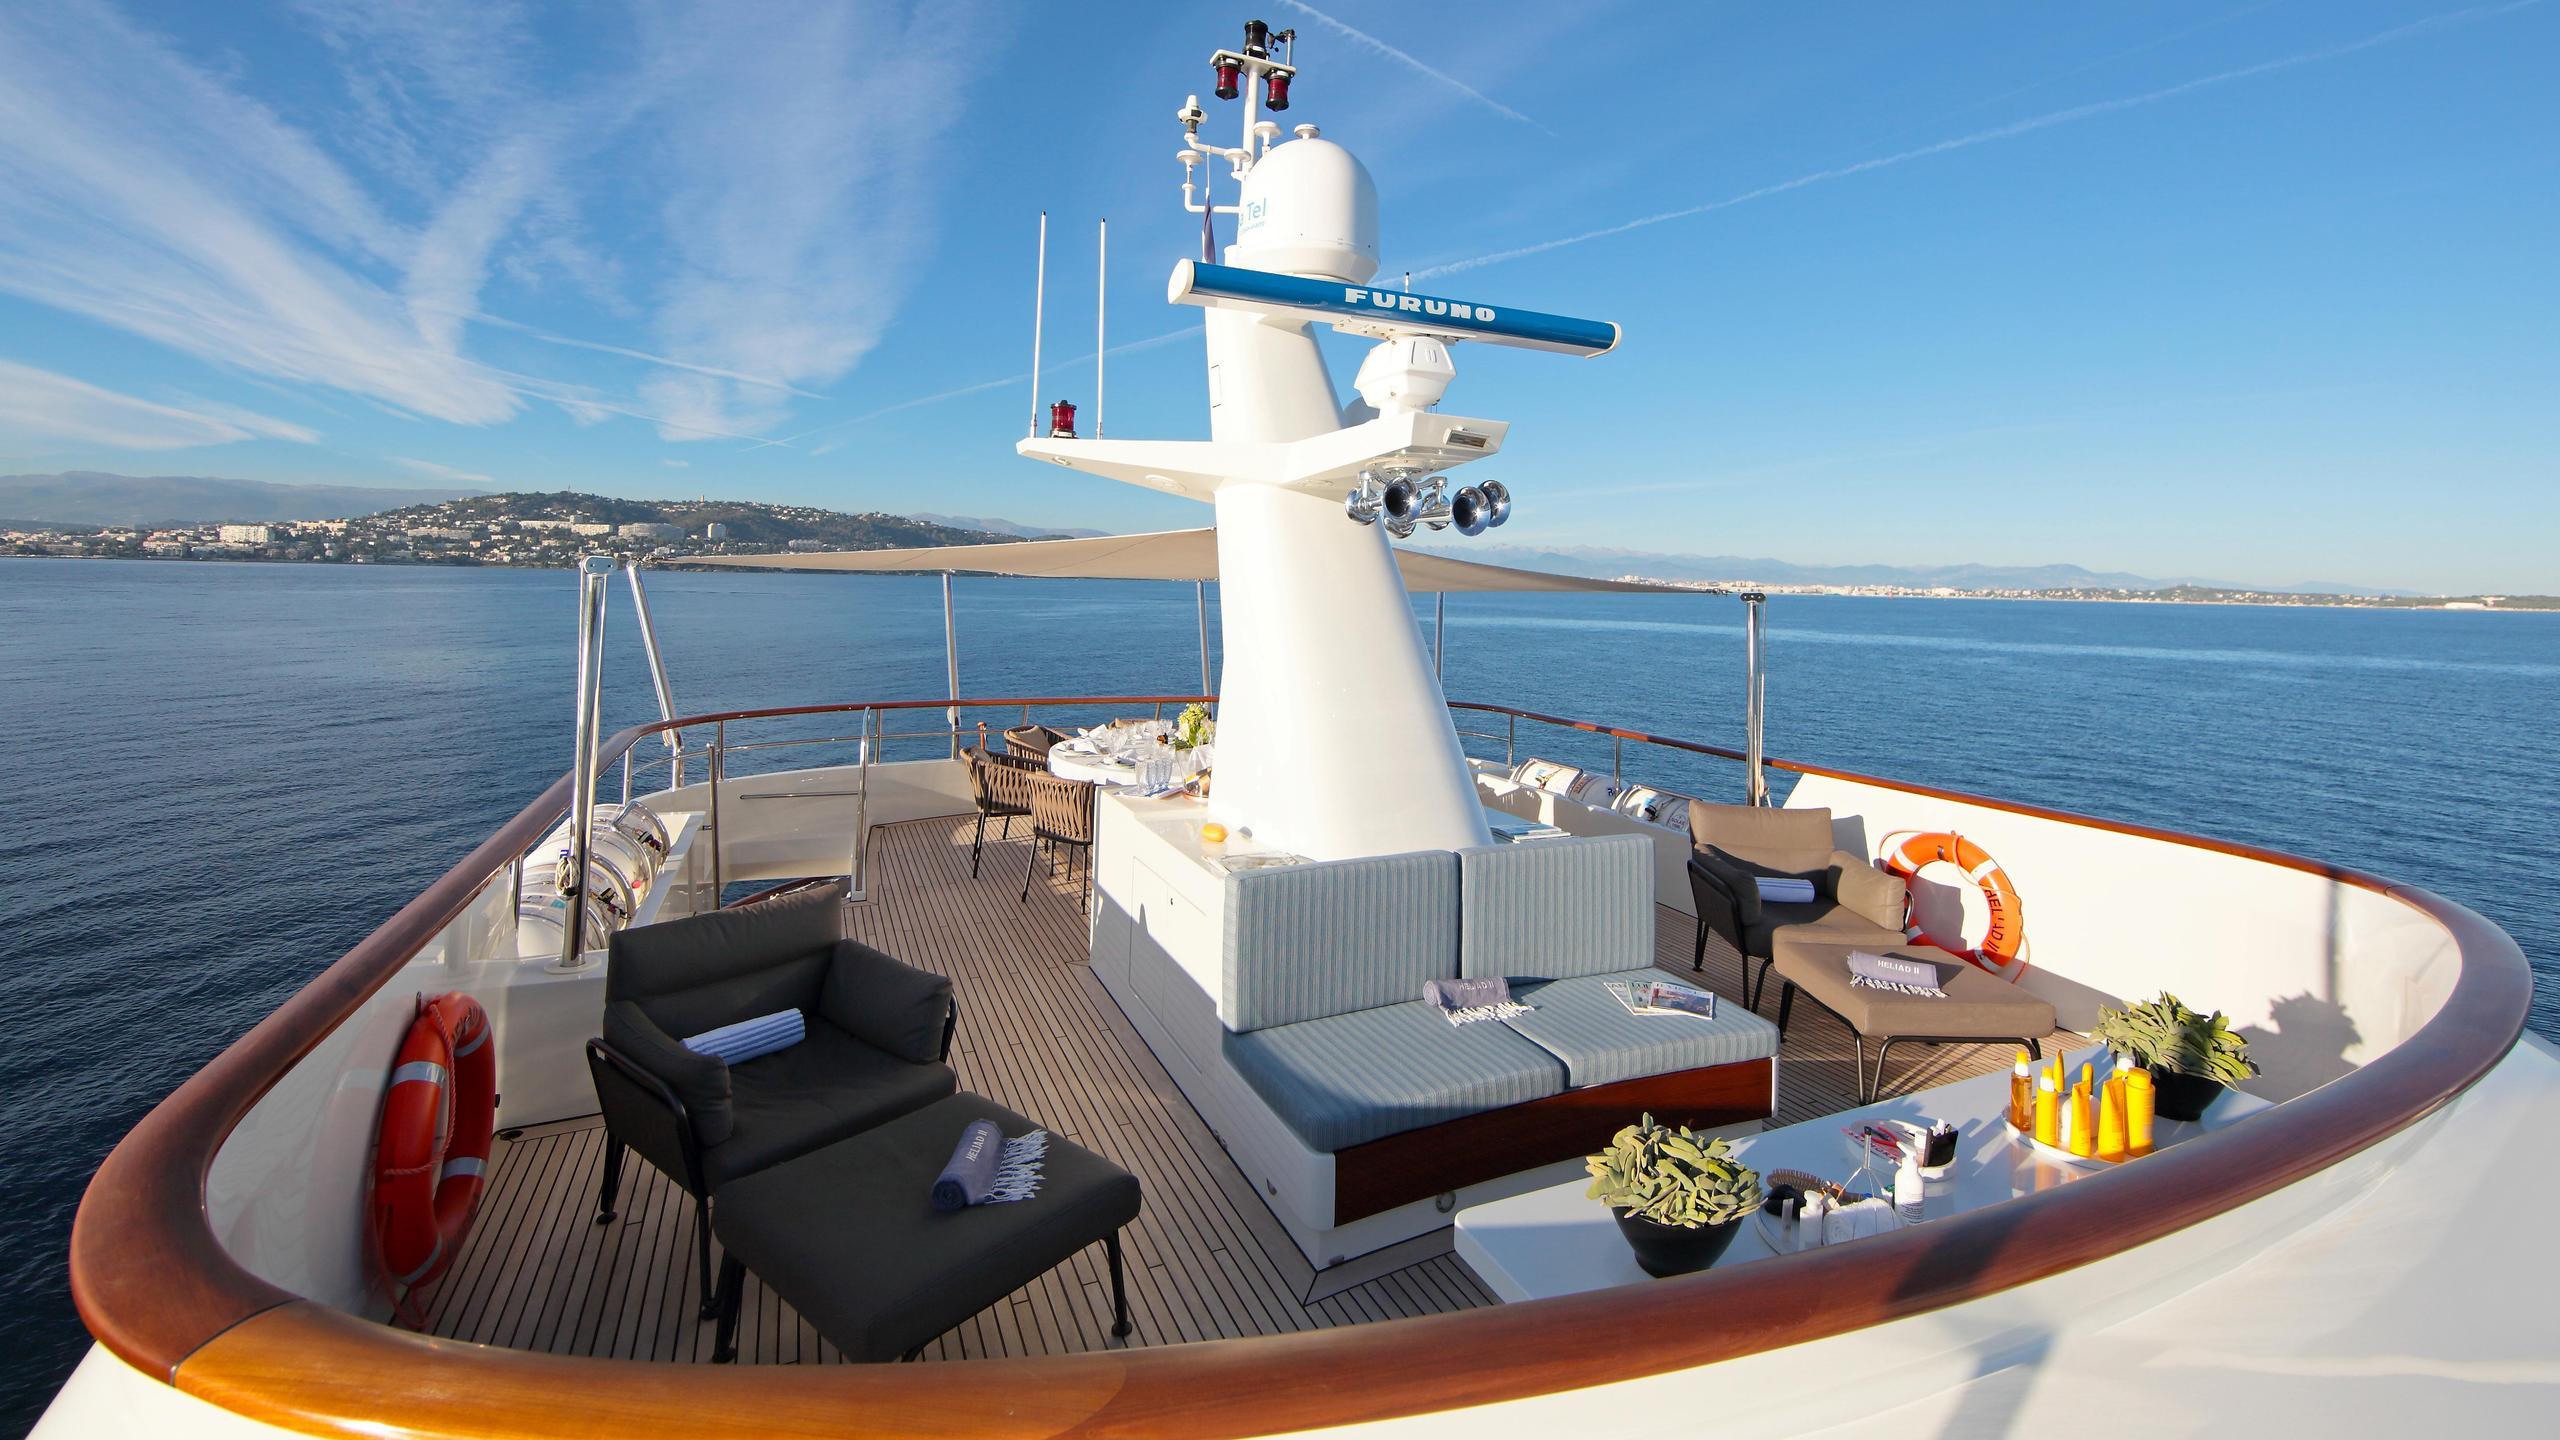 robbie-bobby-heliad-ii-motor-yacht-lynx-2013-33m-sundeck